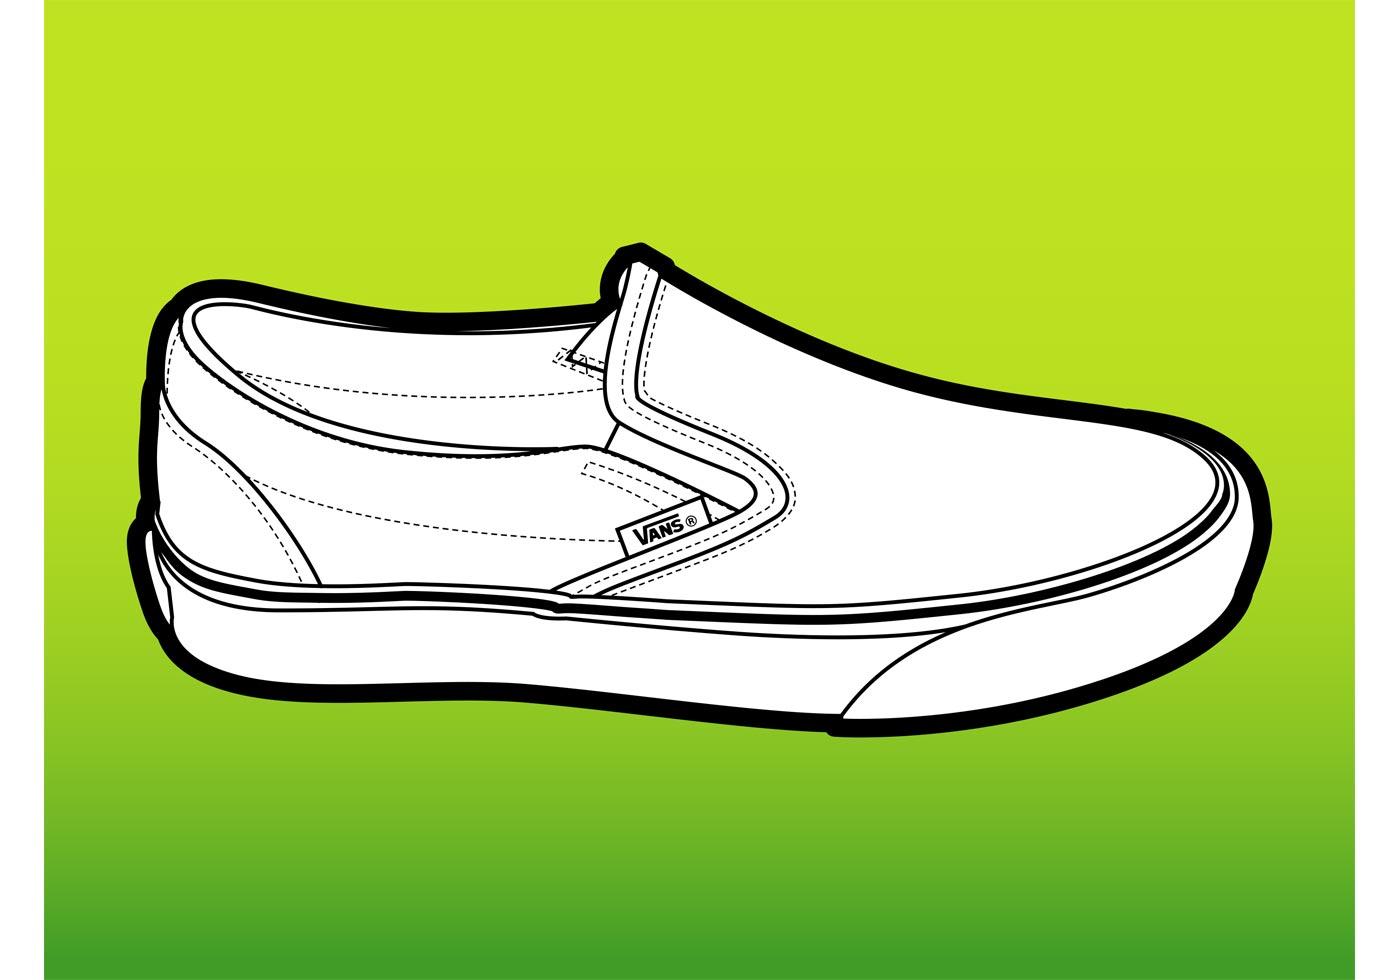 Download Pictures Of Vans Shoes